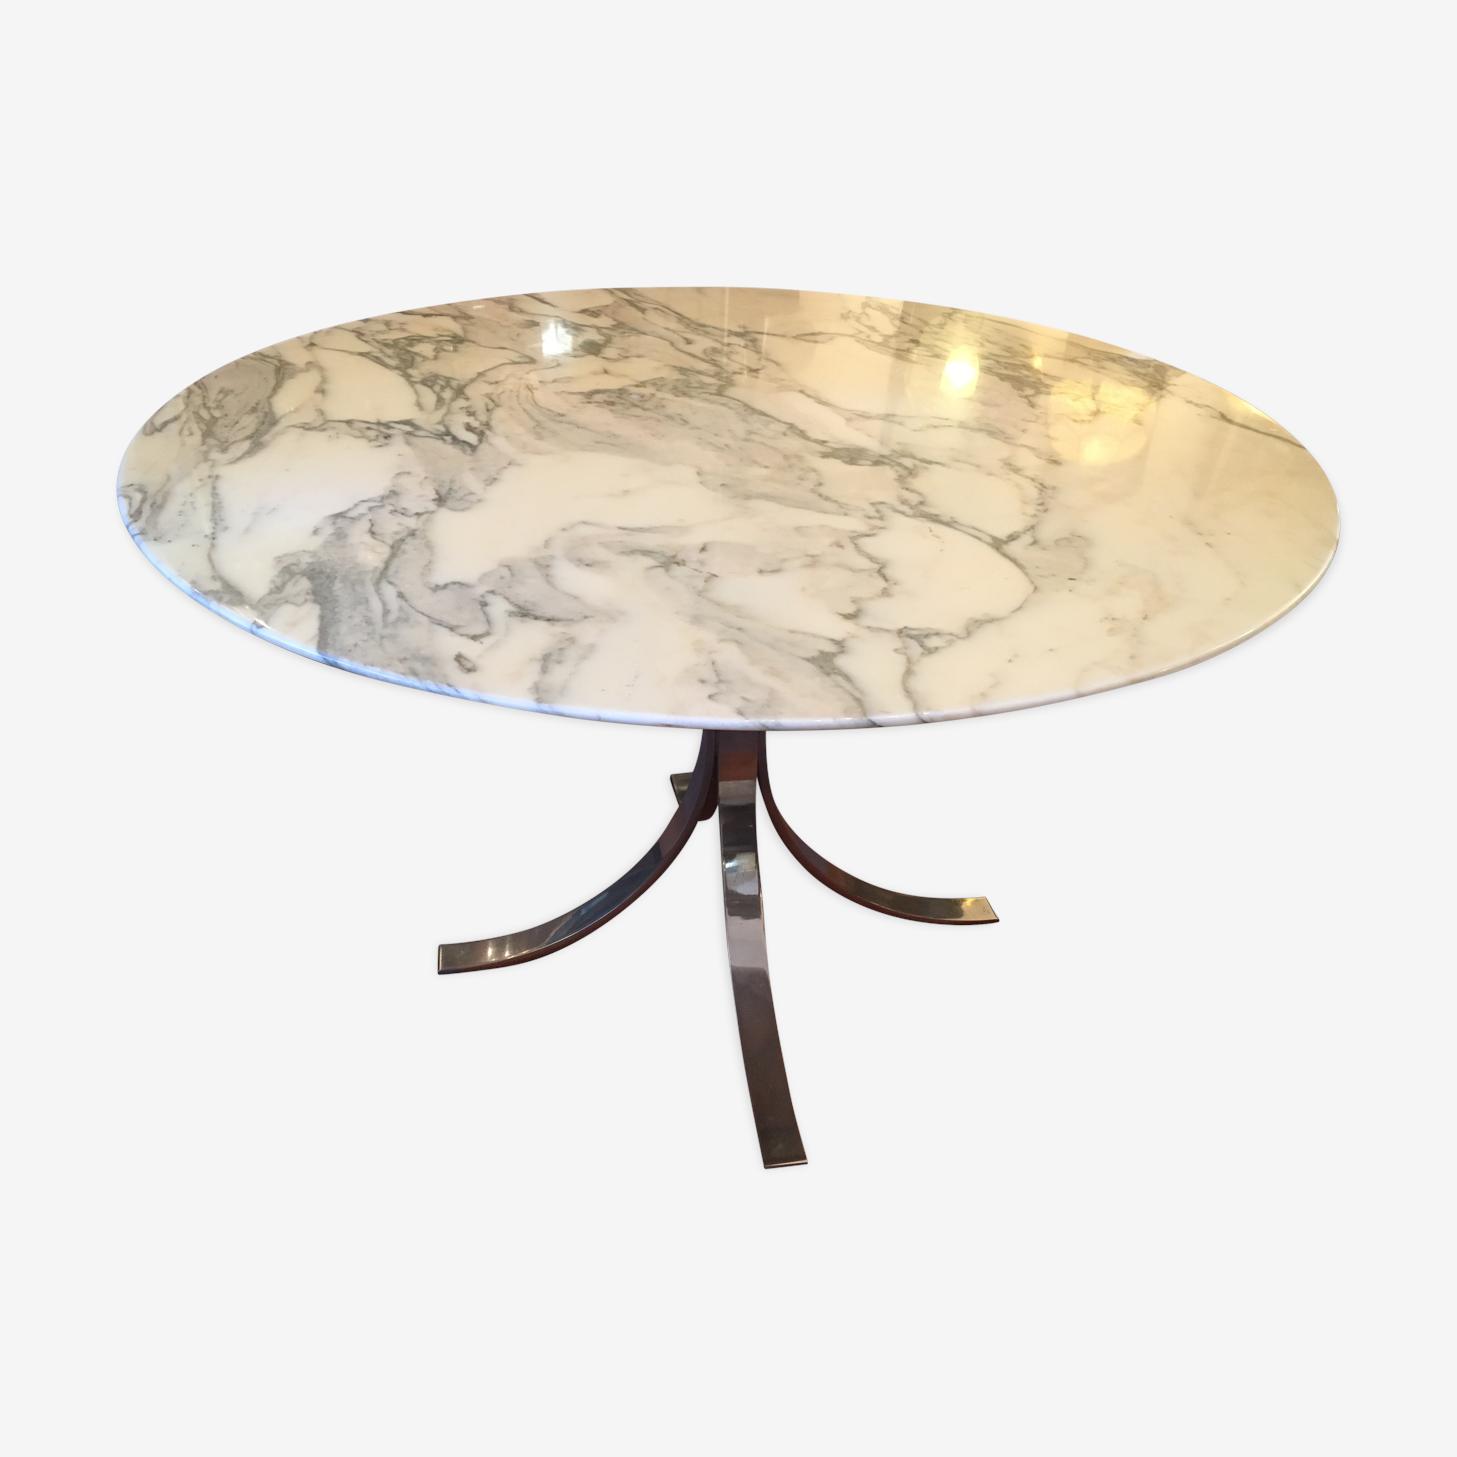 Table en marbre et piètement en inox